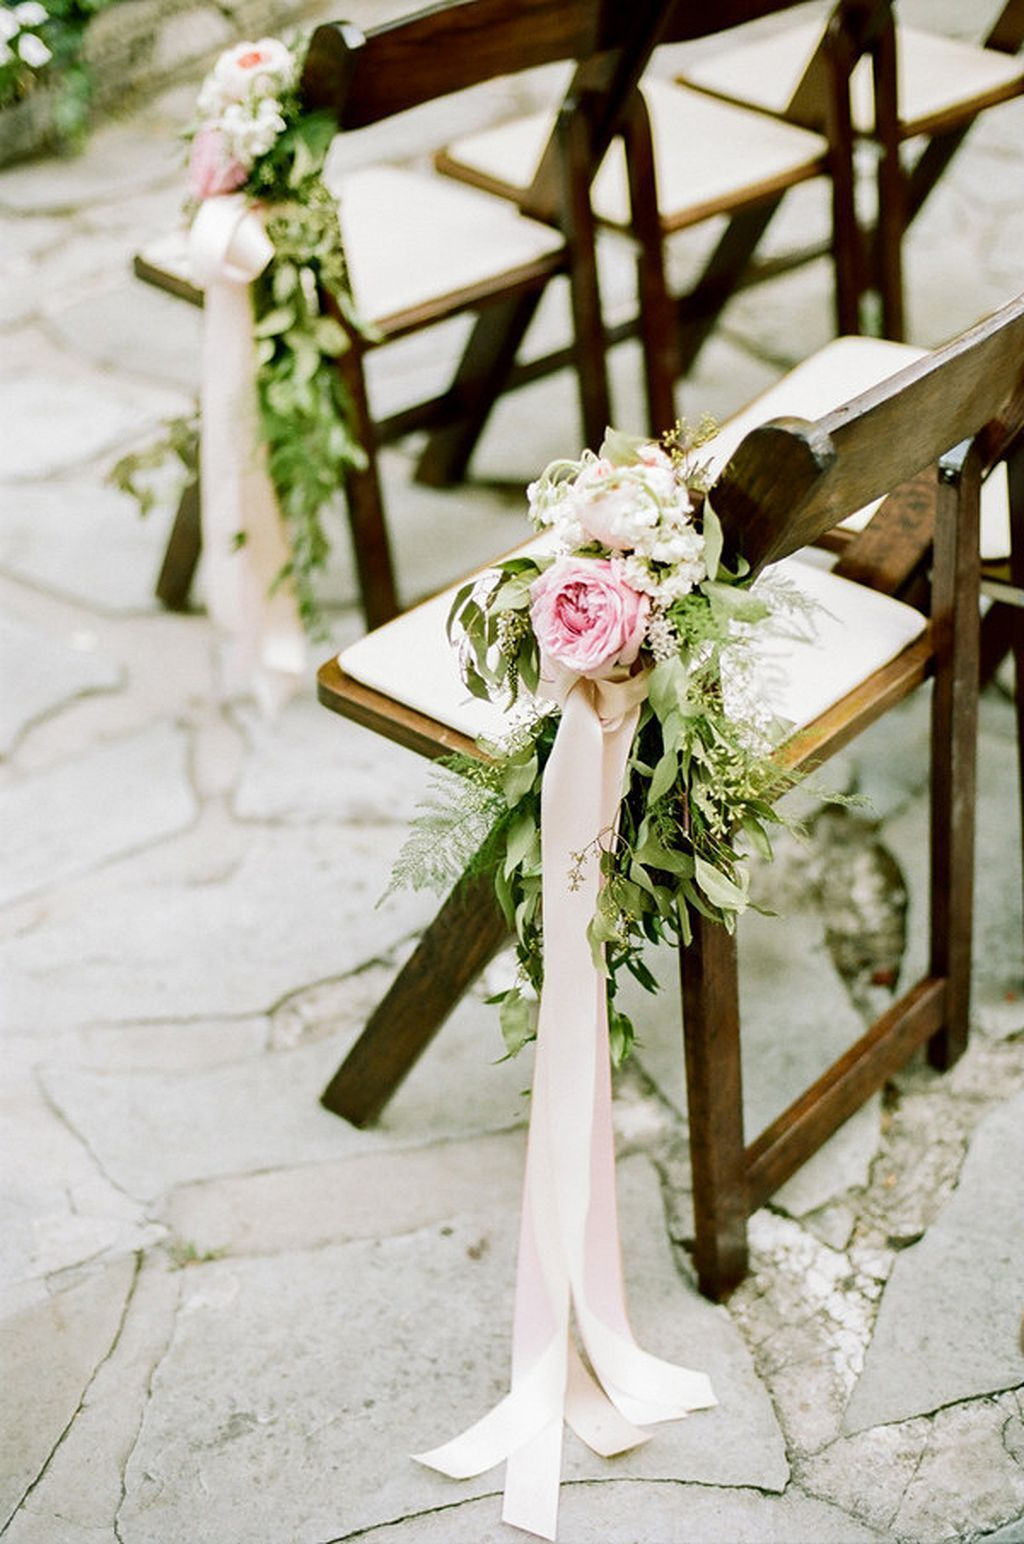 Wedding aisle decor ideas diy   wedding aisle decoration ideas   Weddings and Wedding